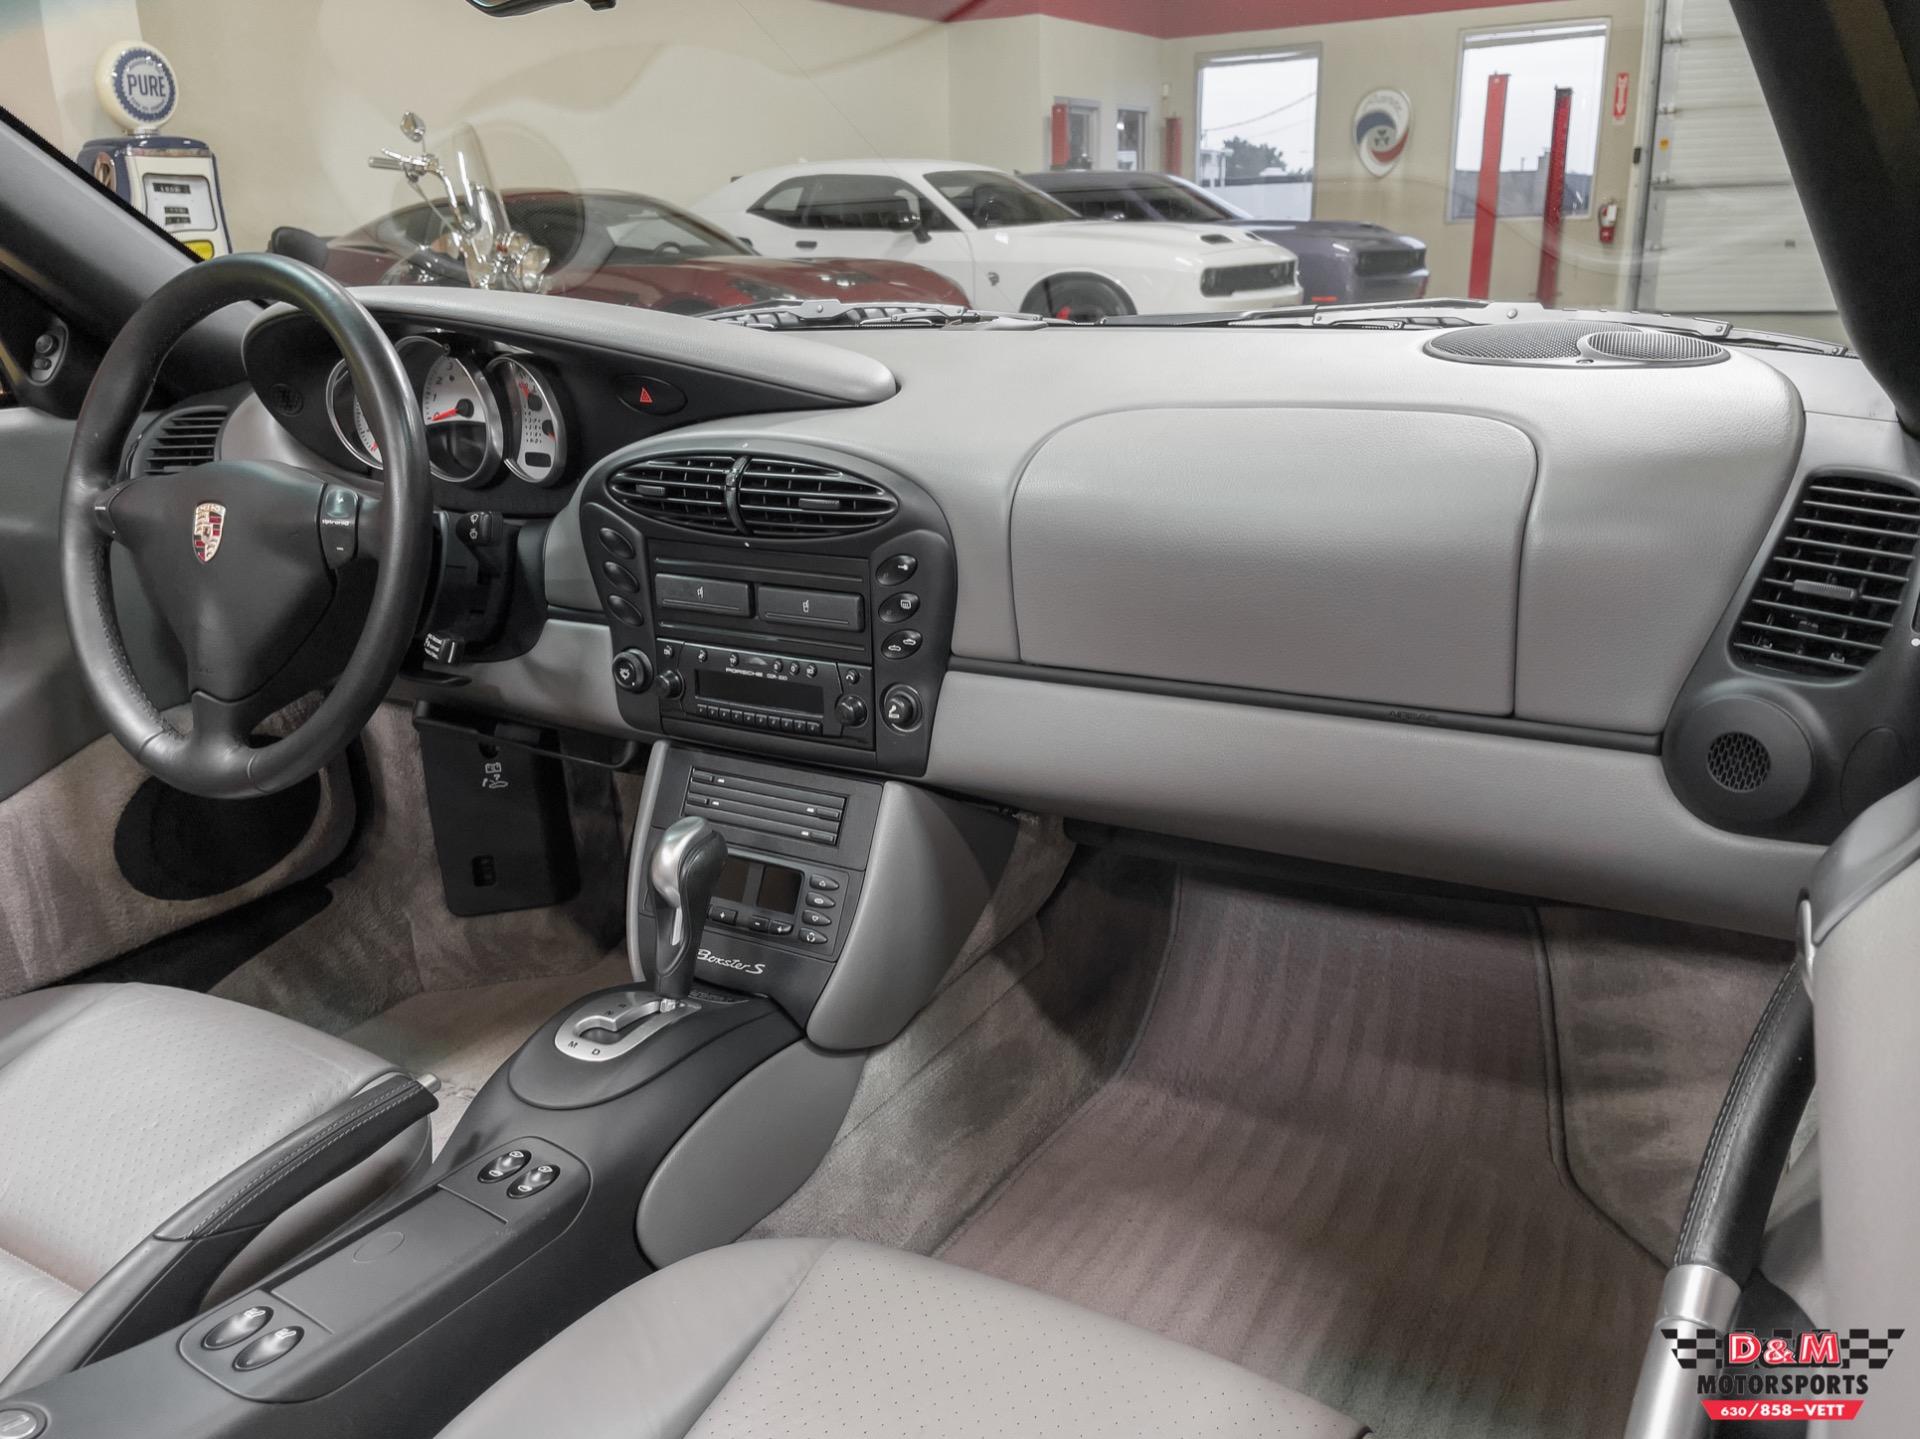 Used 2002 Porsche Boxster S | Glen Ellyn, IL